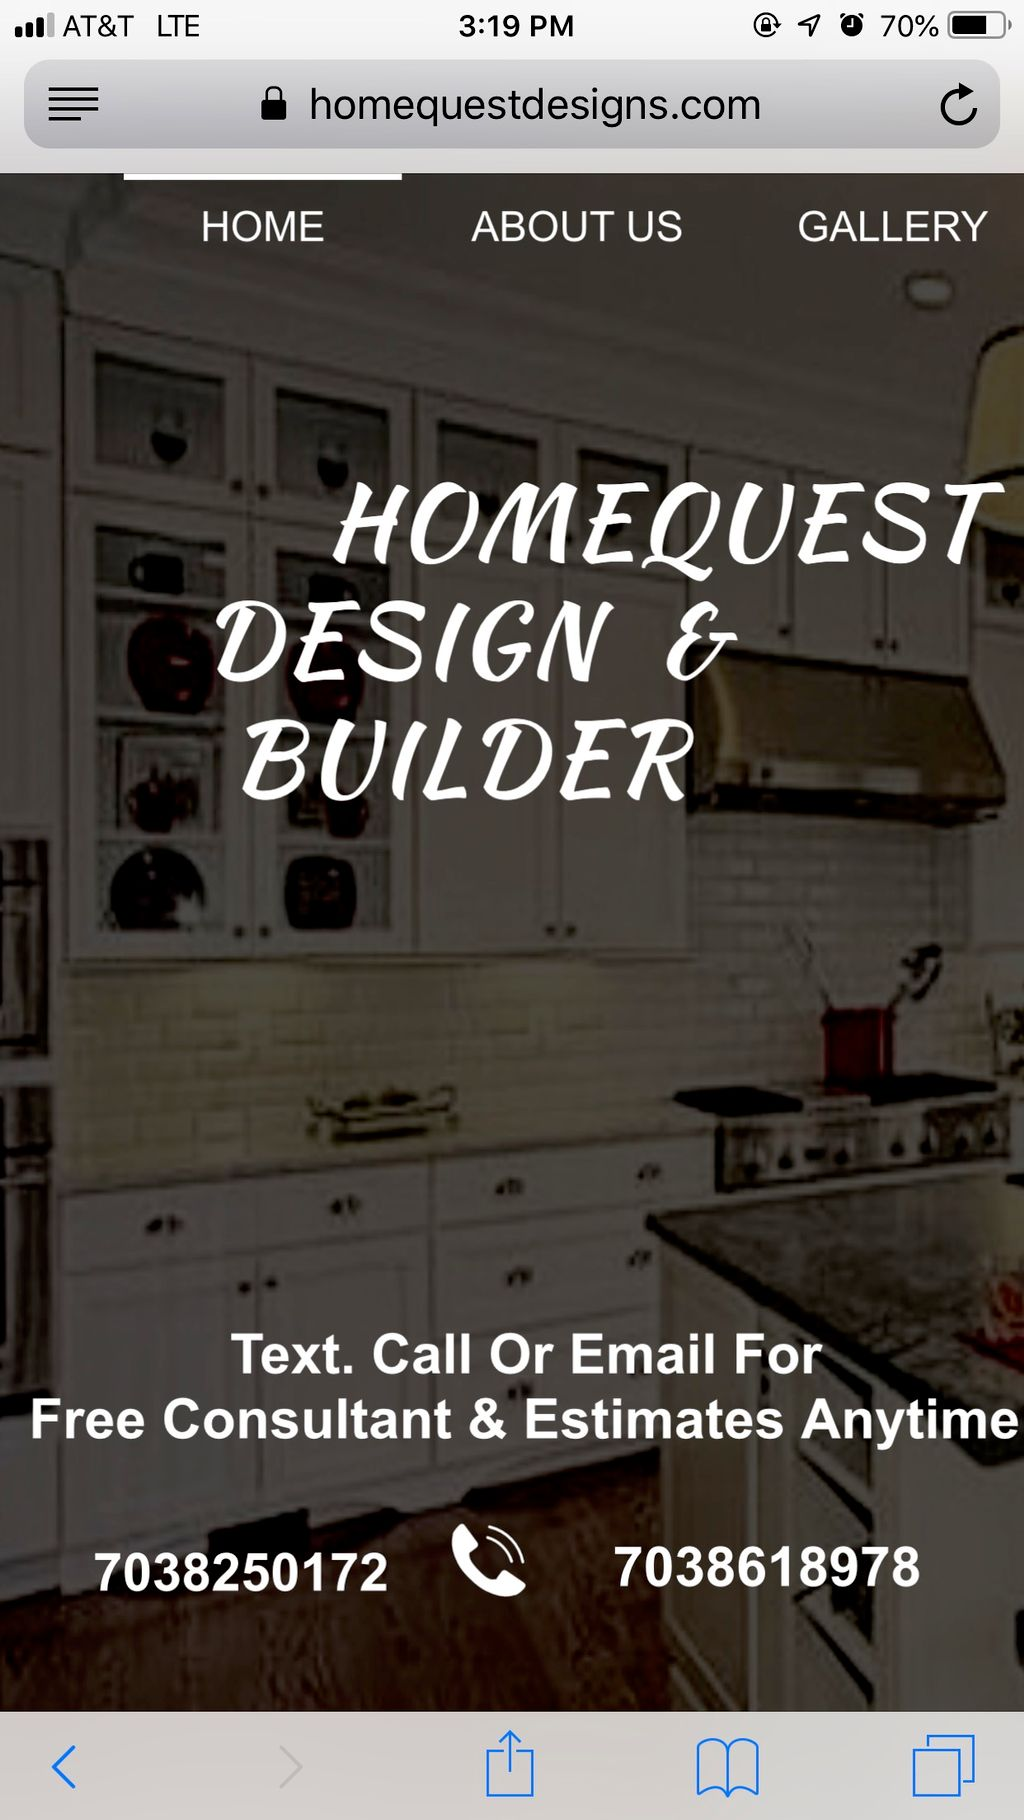 Homequest Design & Builder